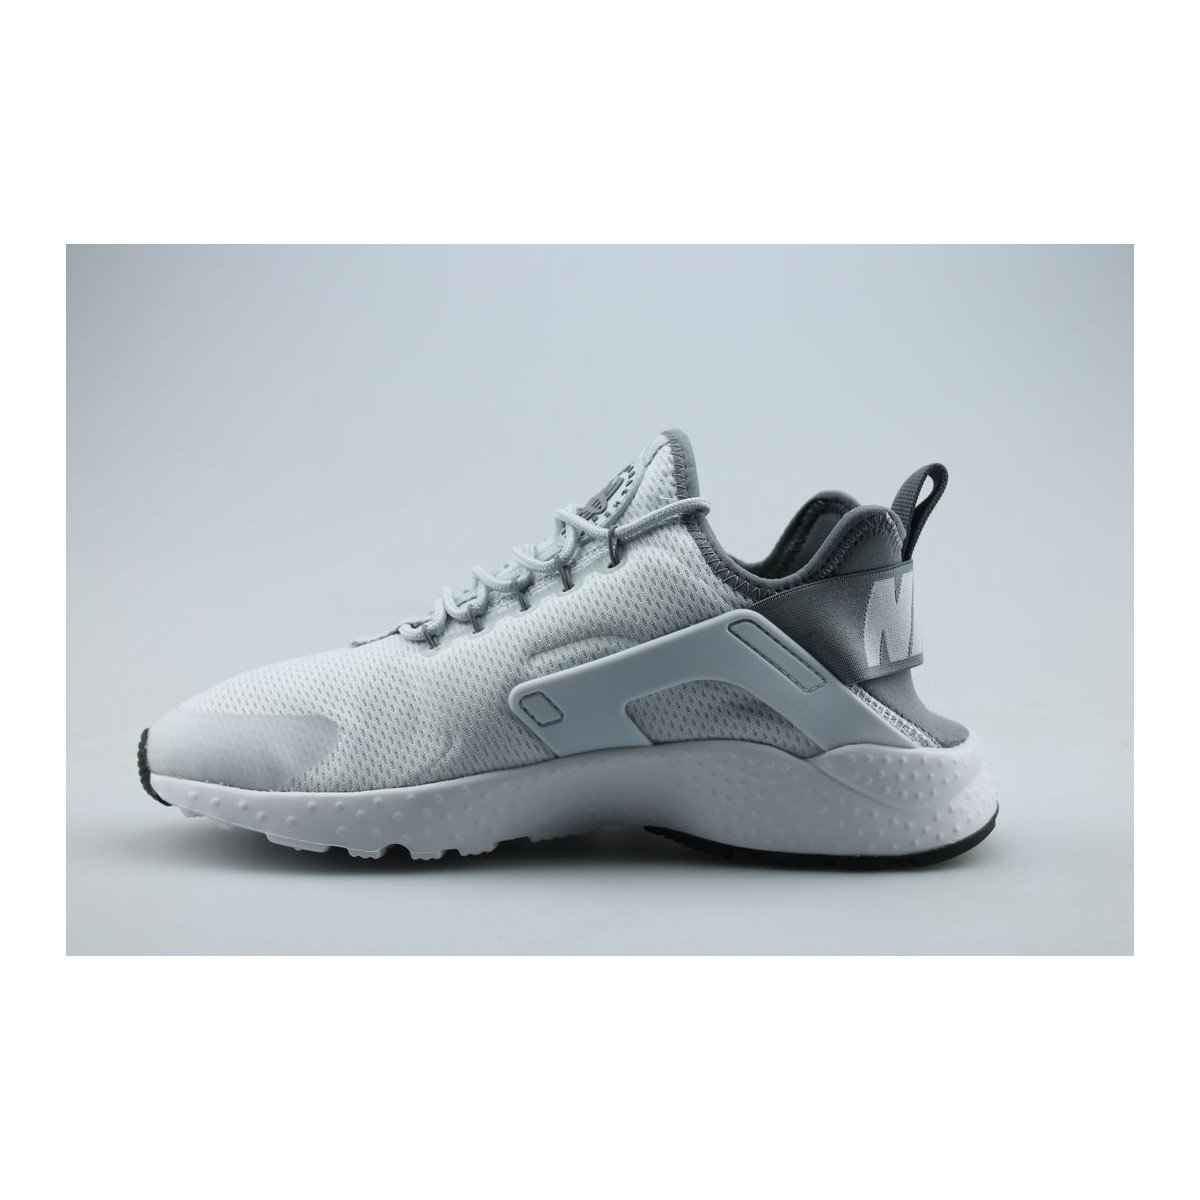 Nike Damen Damen Damen Air Huarache Run Ultra Turnschuhe fe7f4e